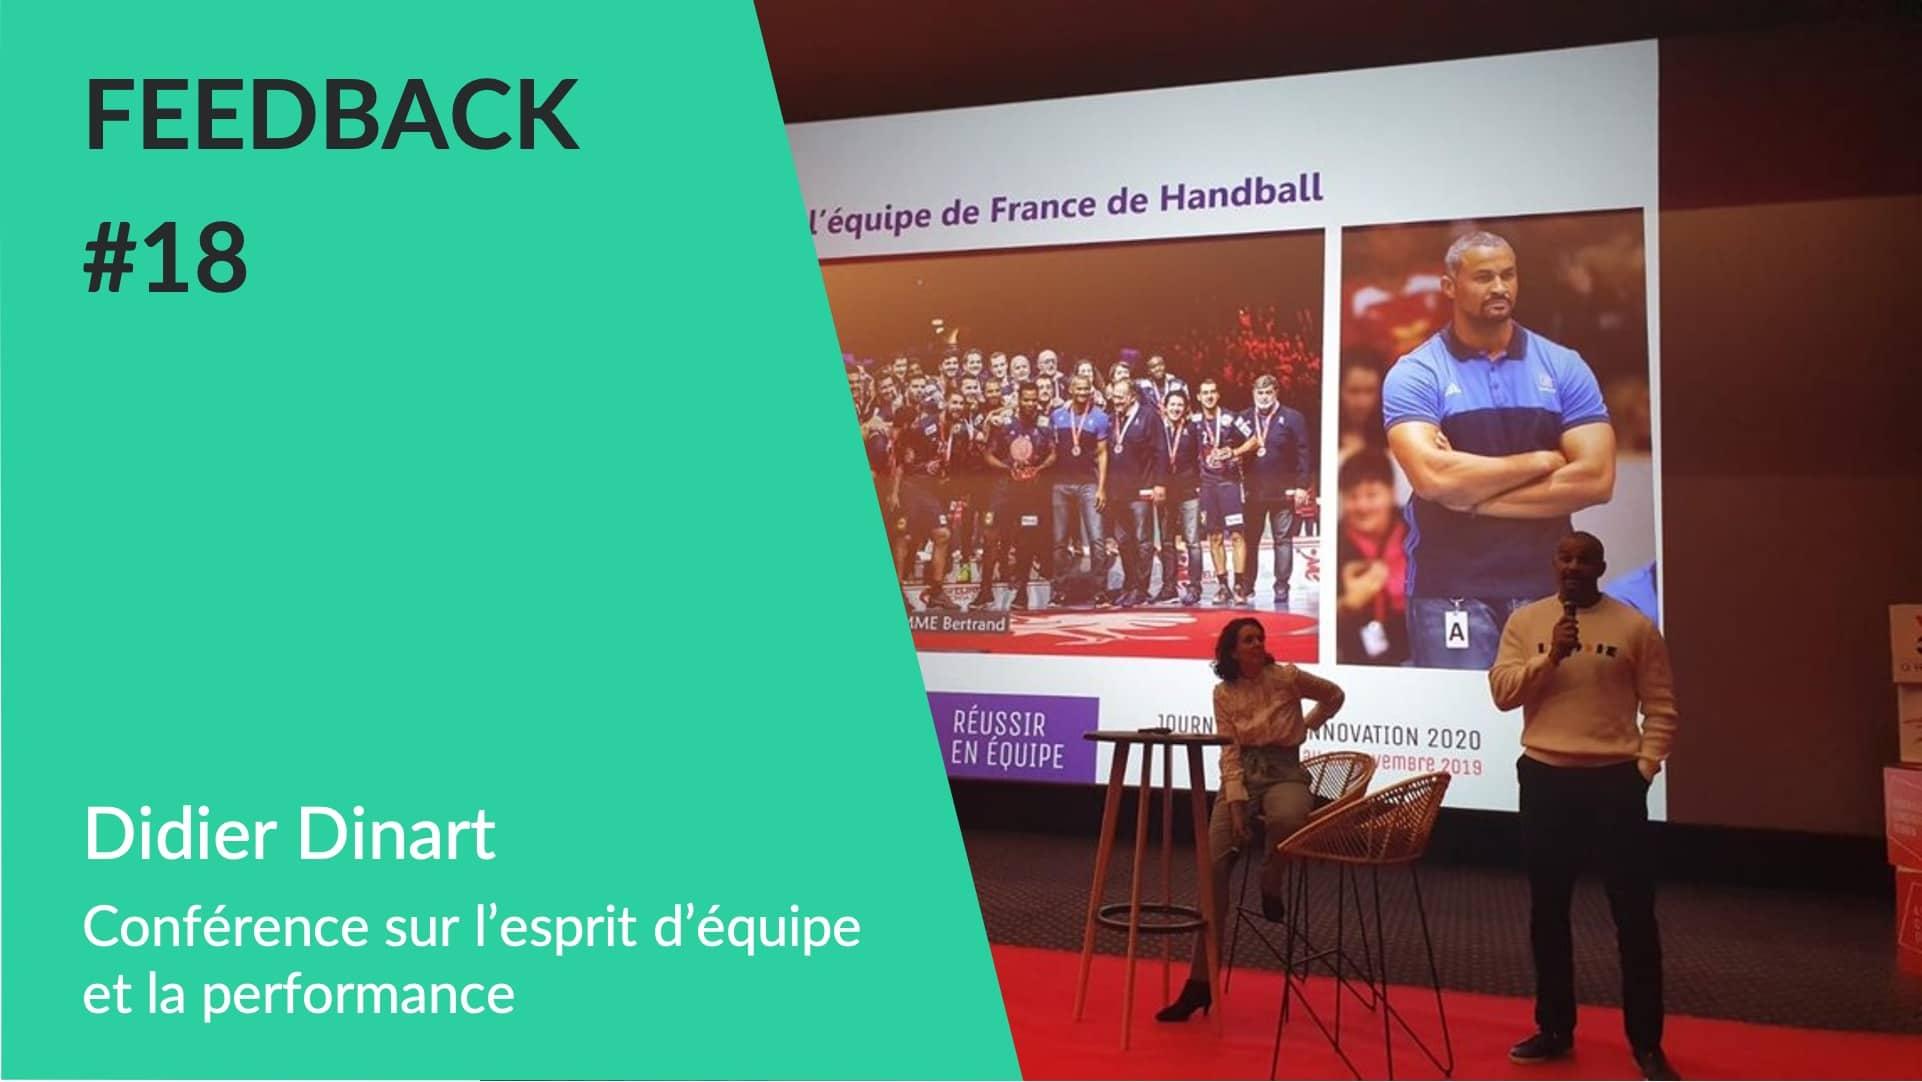 Conférence Didier Dinart esprit équipe - Feedback